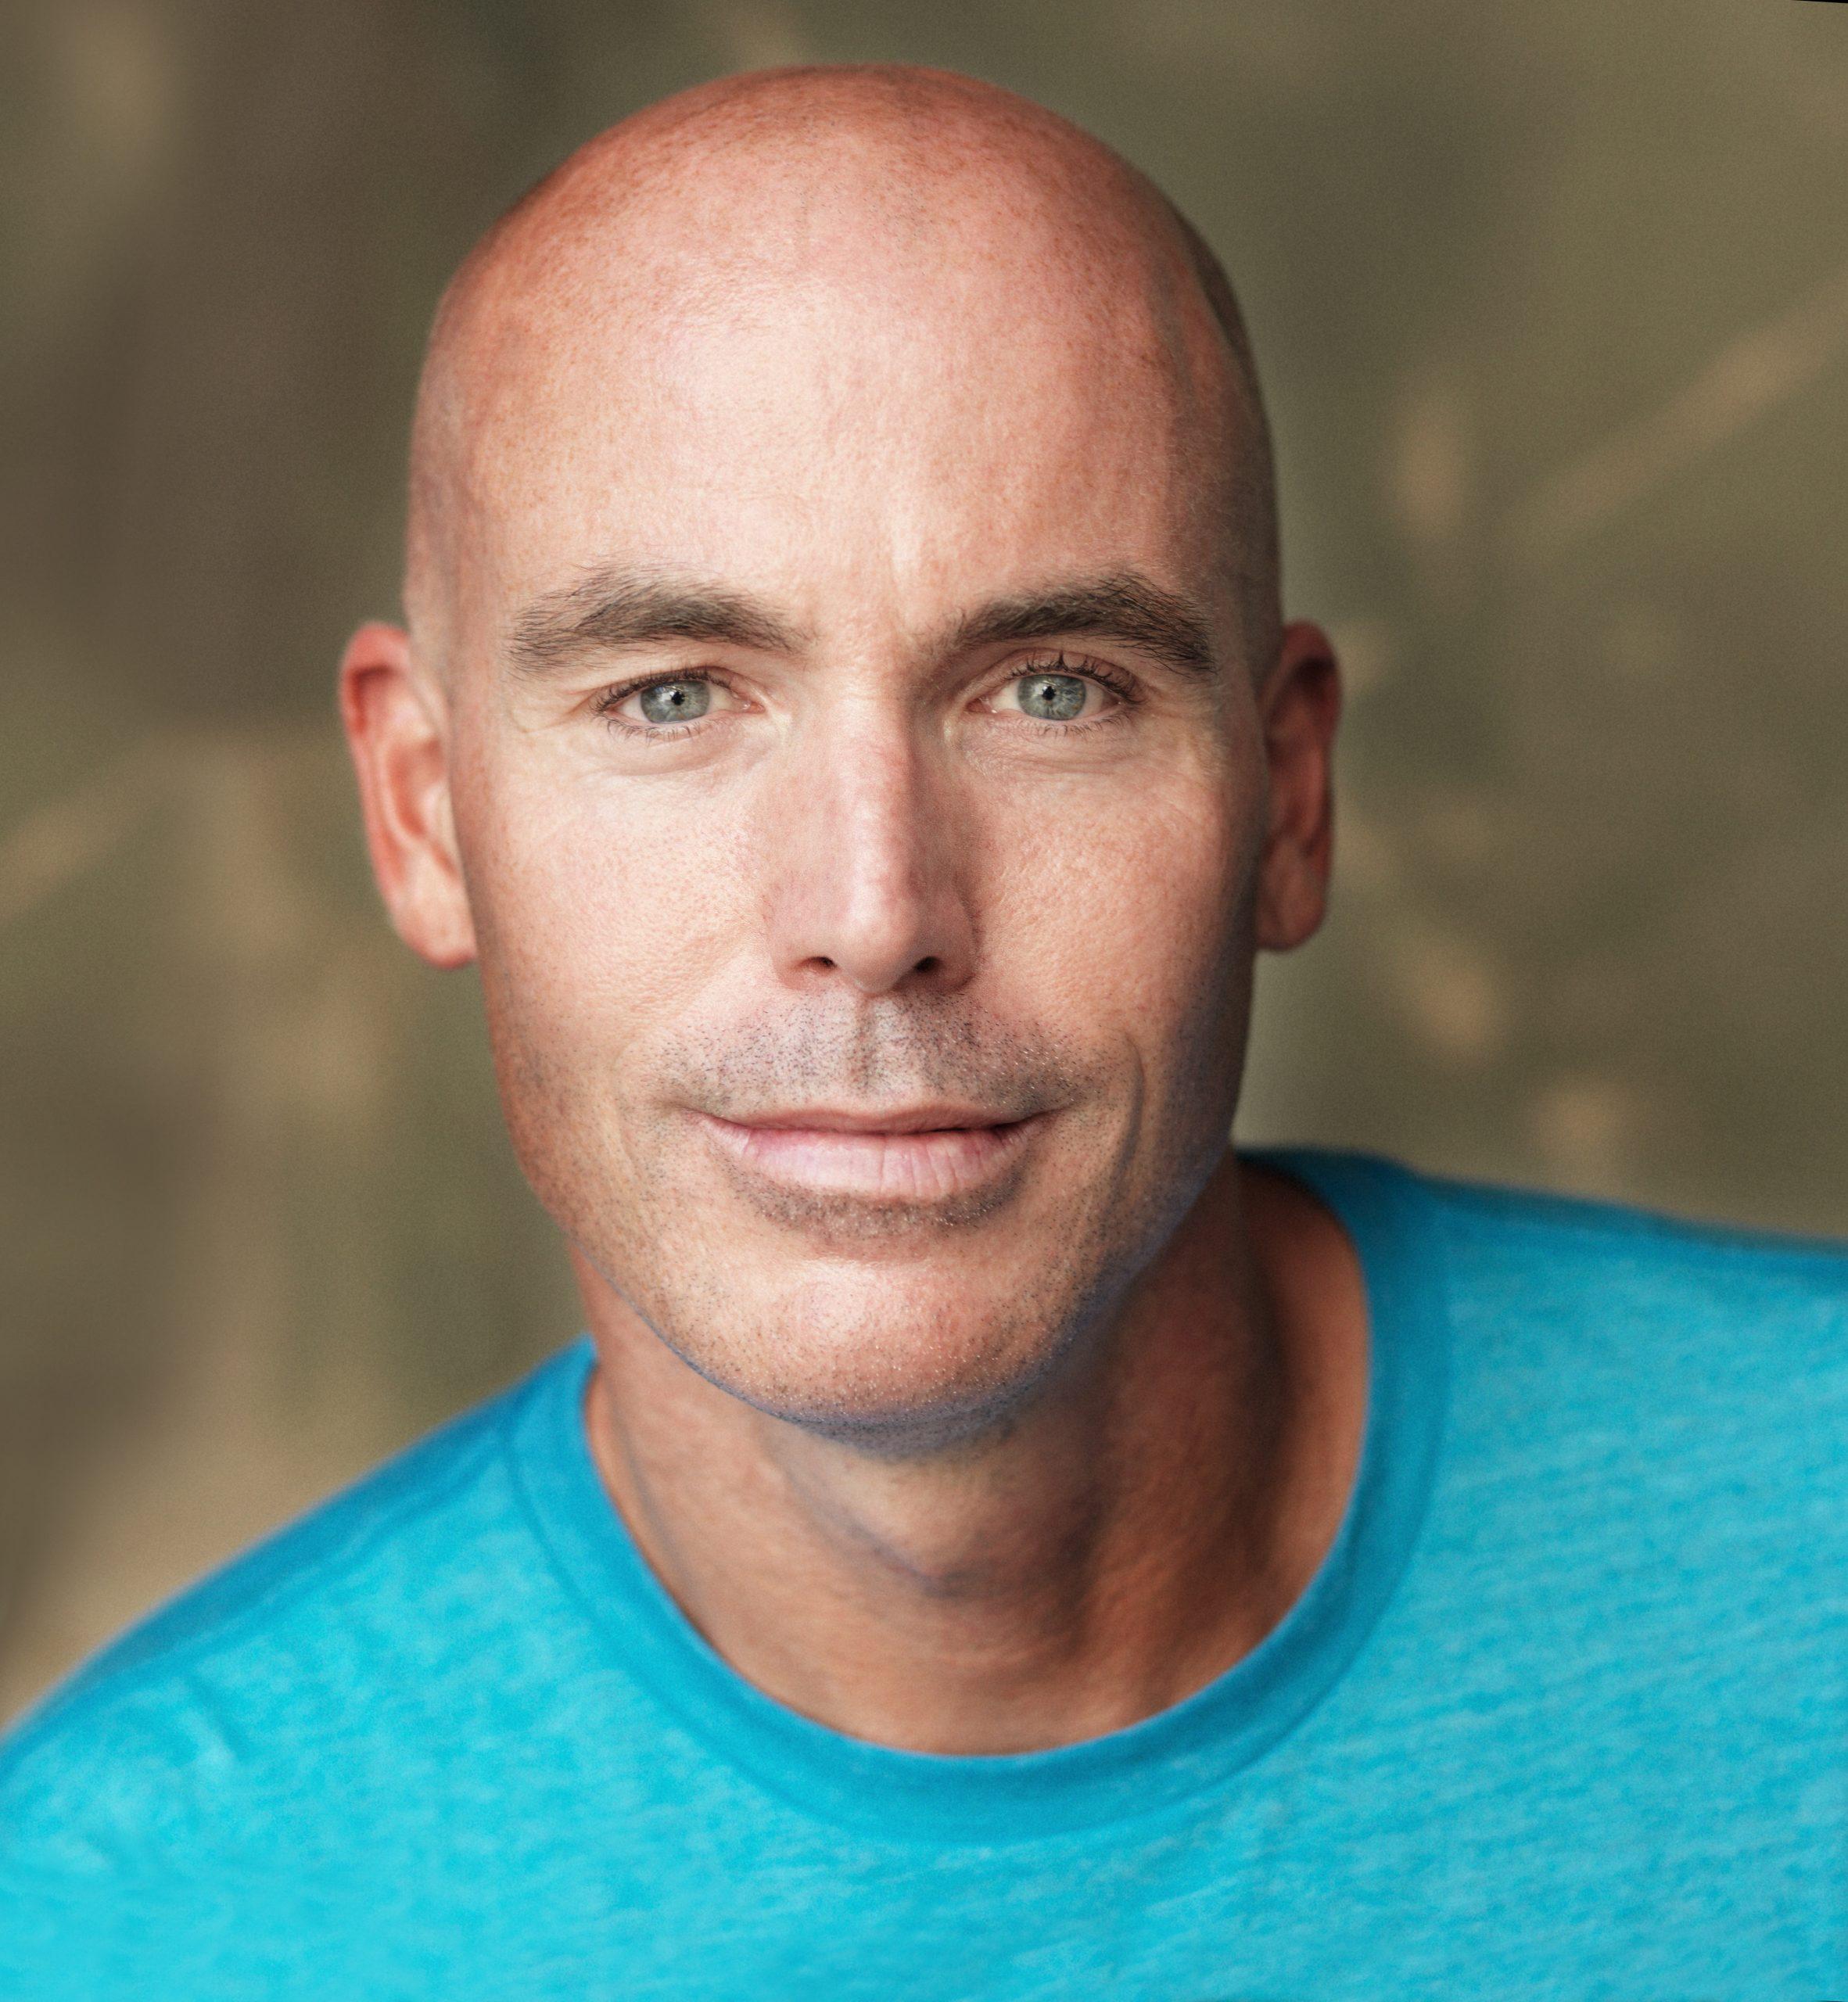 Jason Hughes on Life Changes With Filippo - Radio Show #246